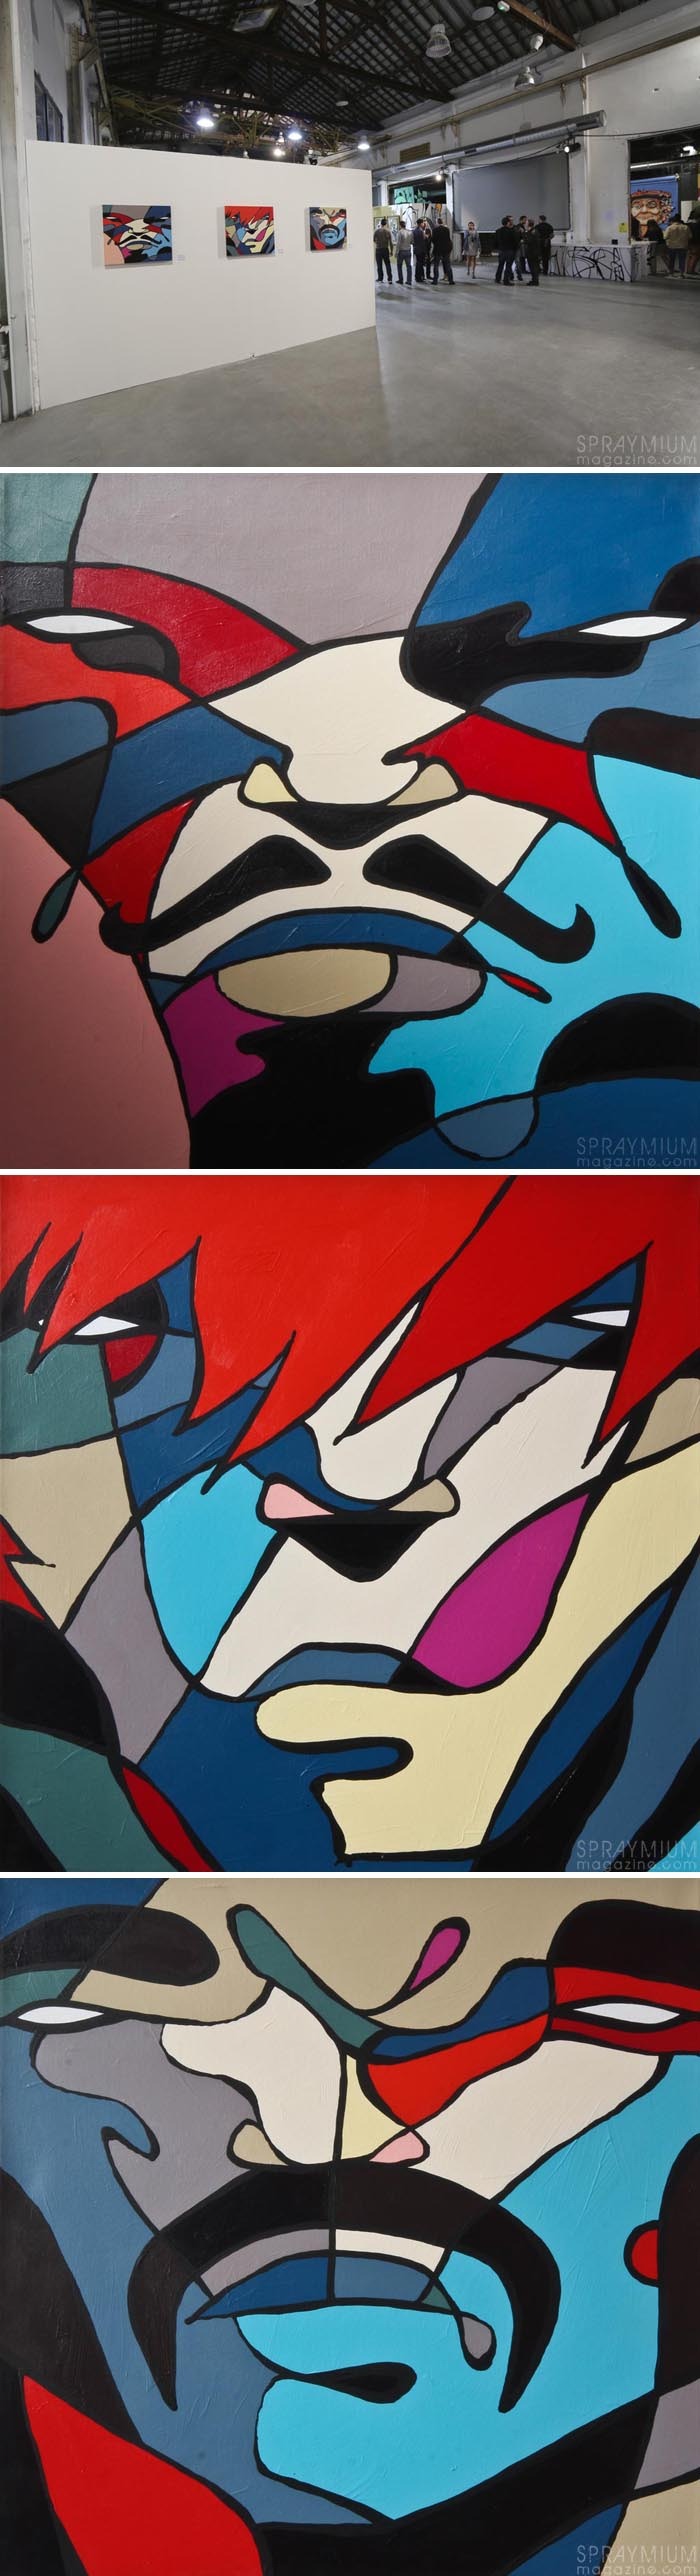 exposition mister freeze toulouse art urbain contemporain graffiti postgraffiti streetart muralism spraymium sozy